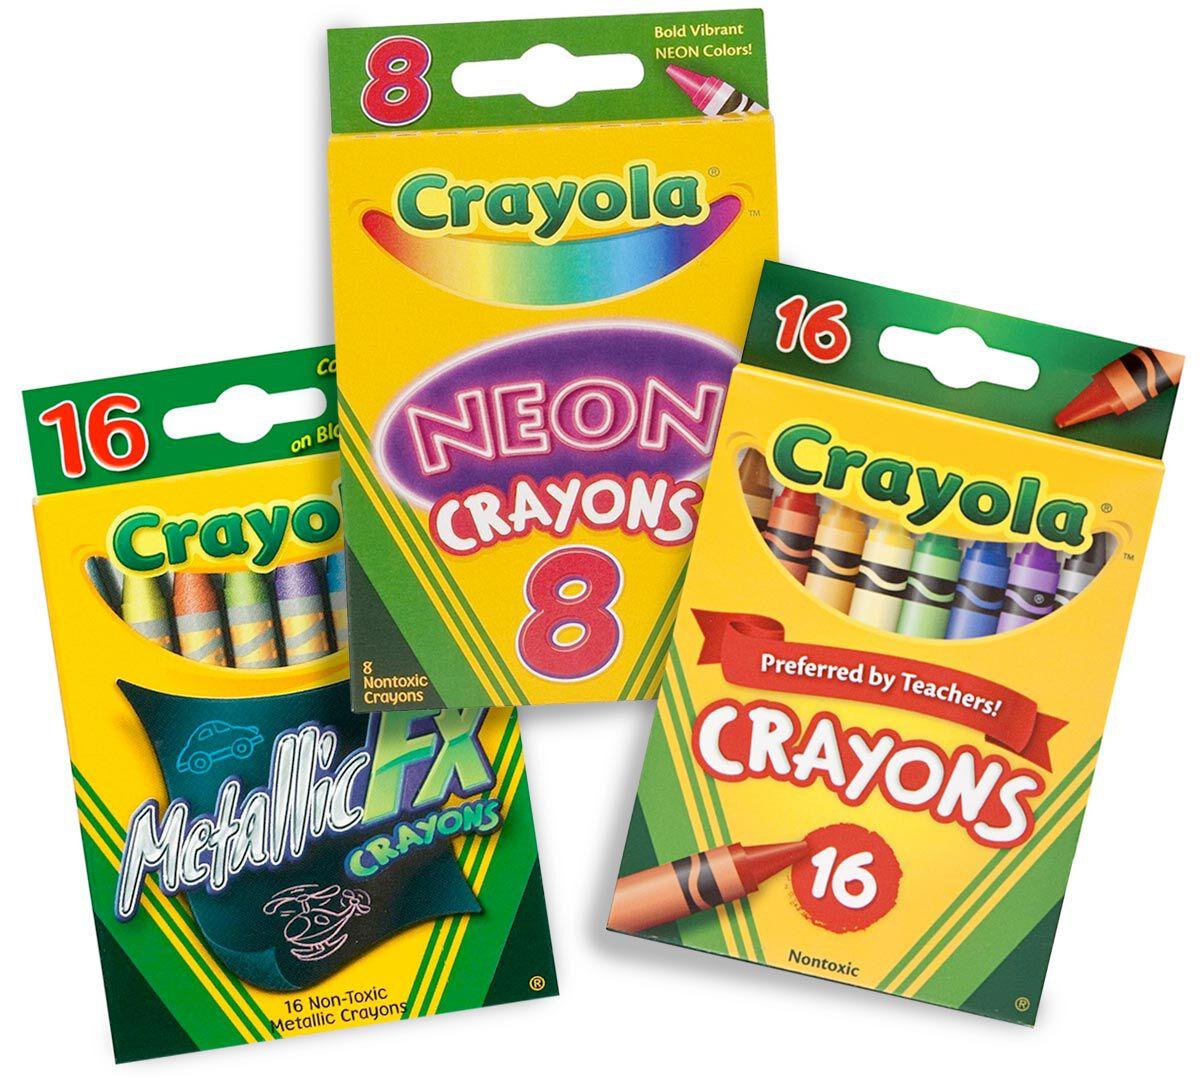 Crayola crayon making machine